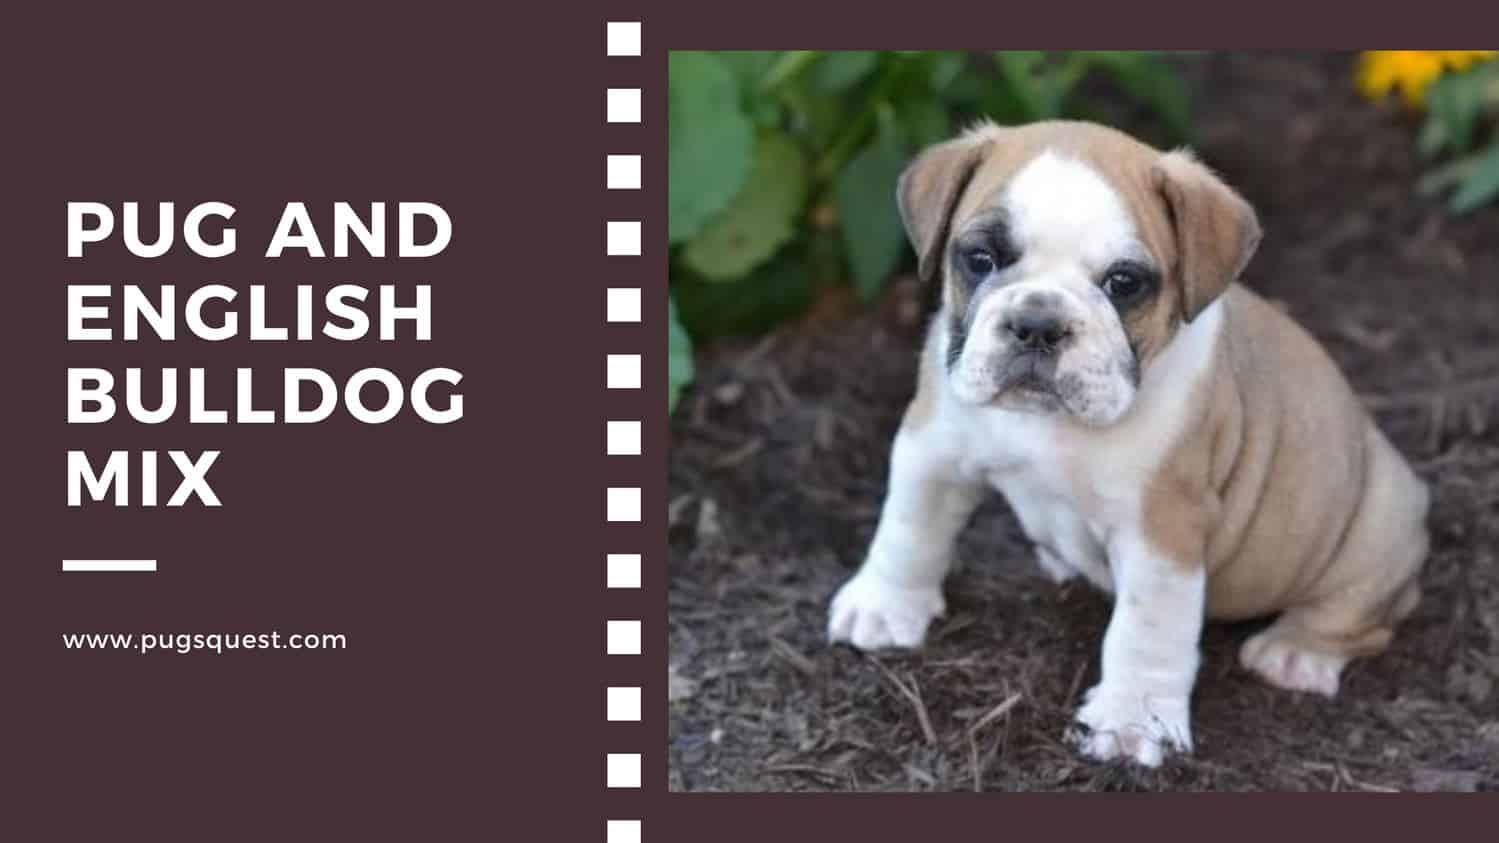 Pug and english bulldog mix